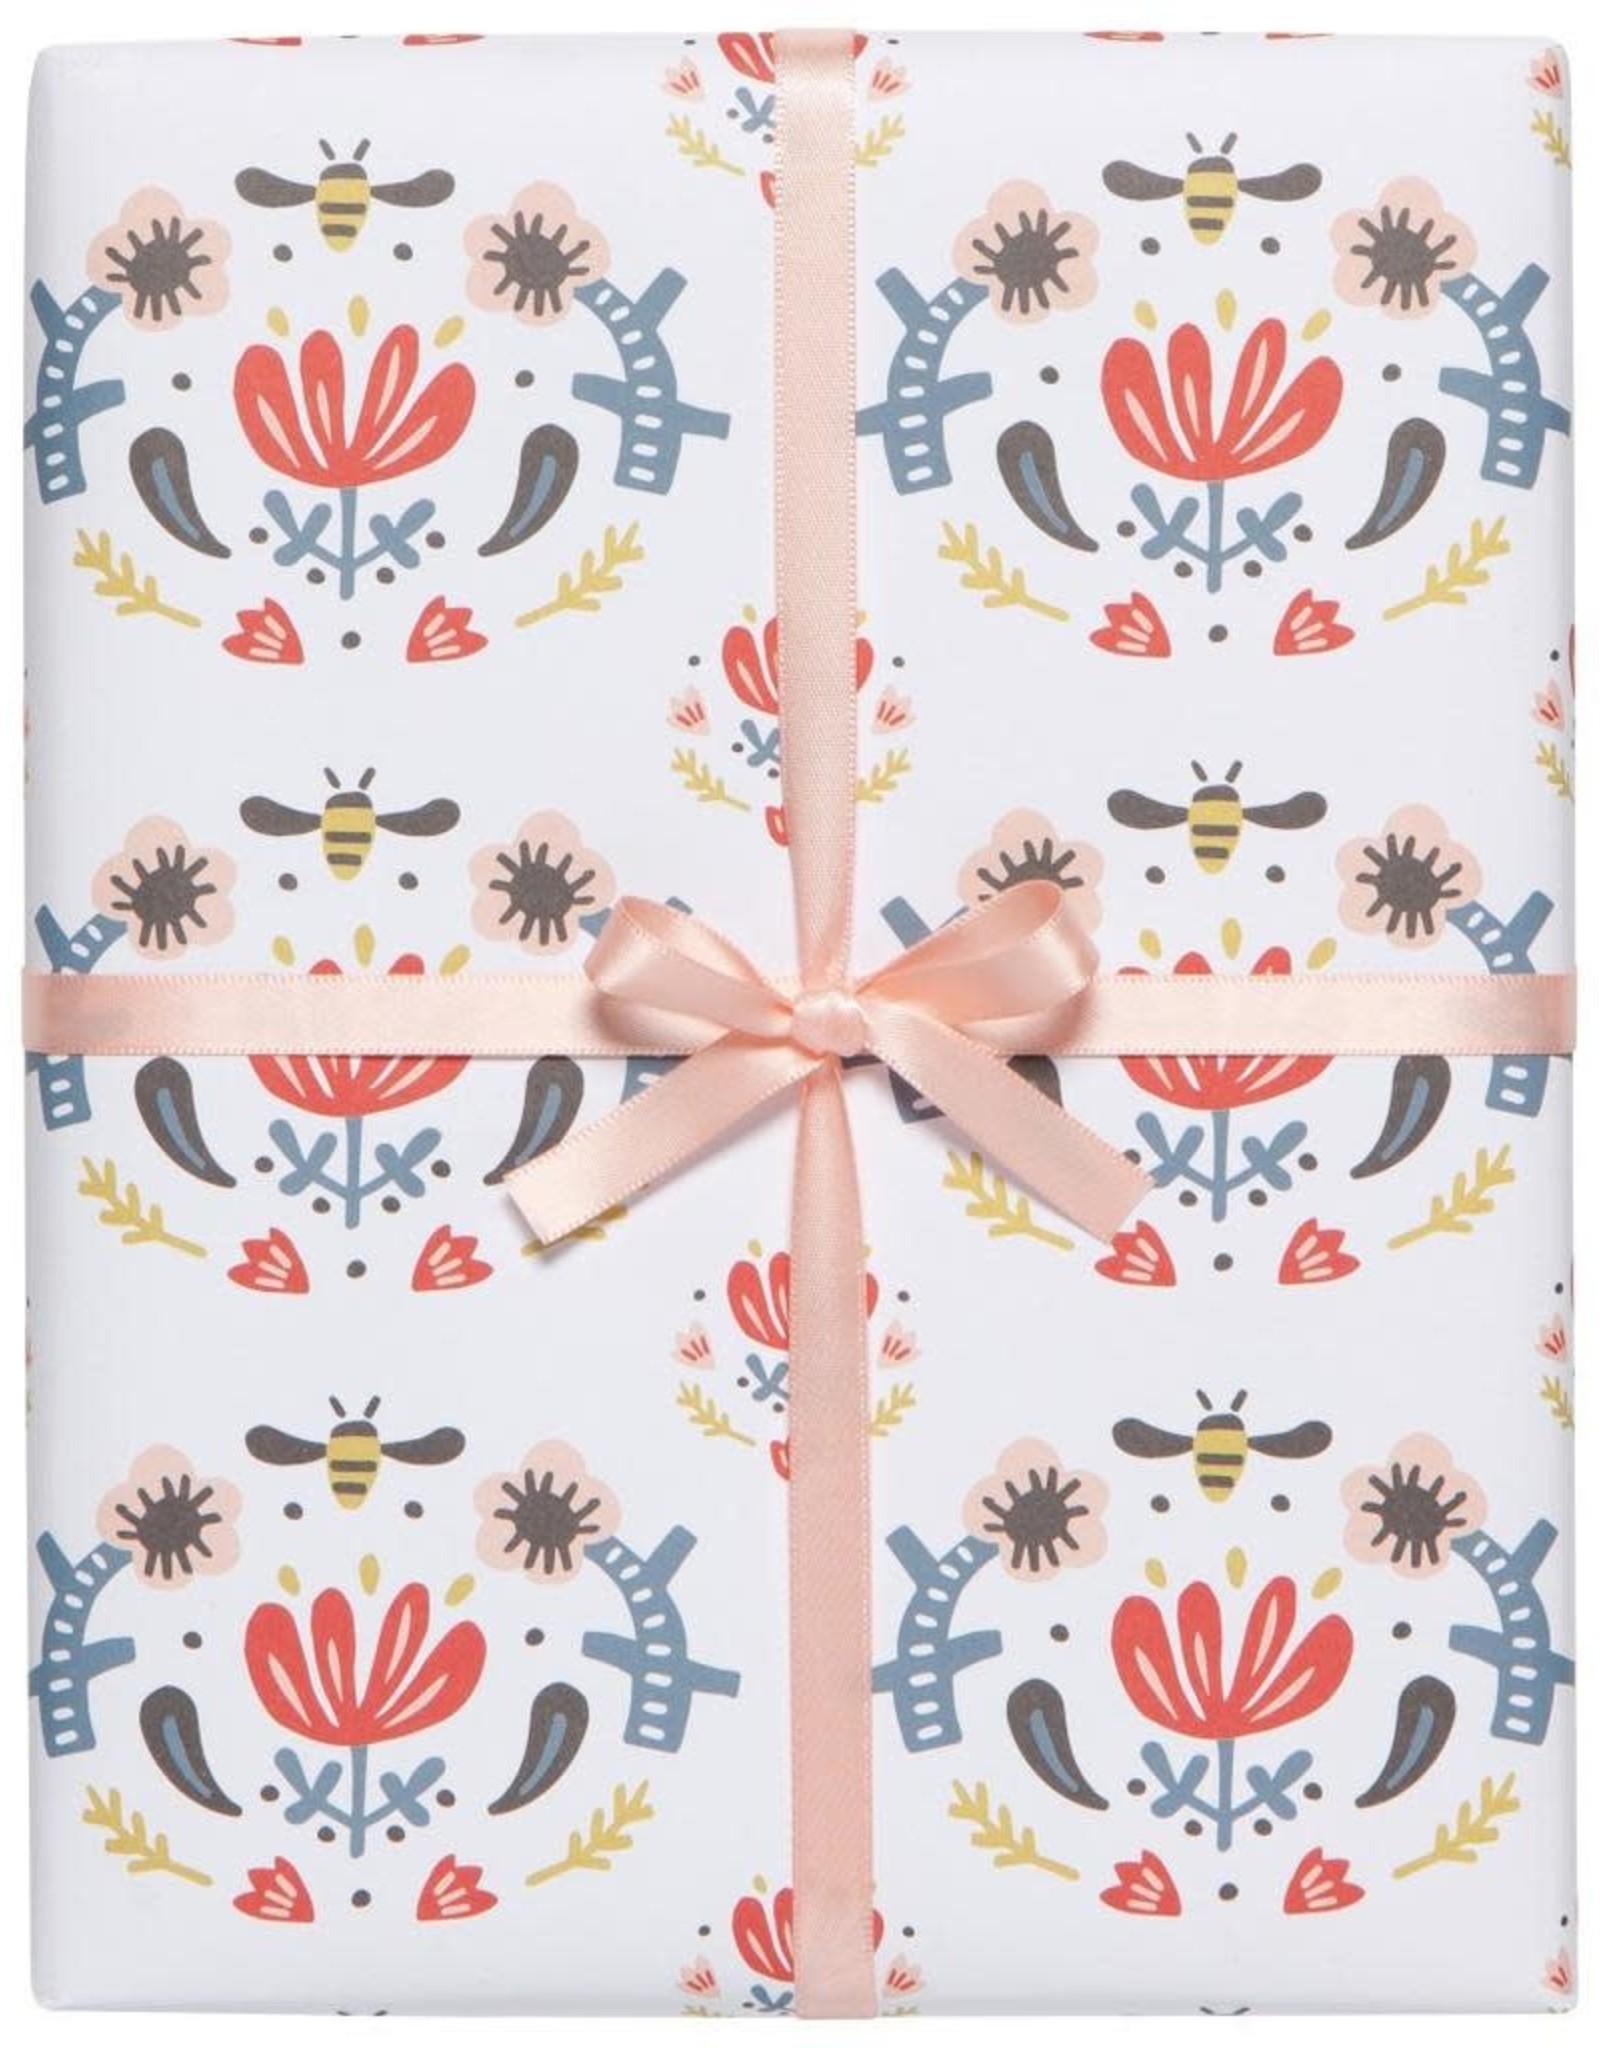 Danica Danica Frida Gift Wrap